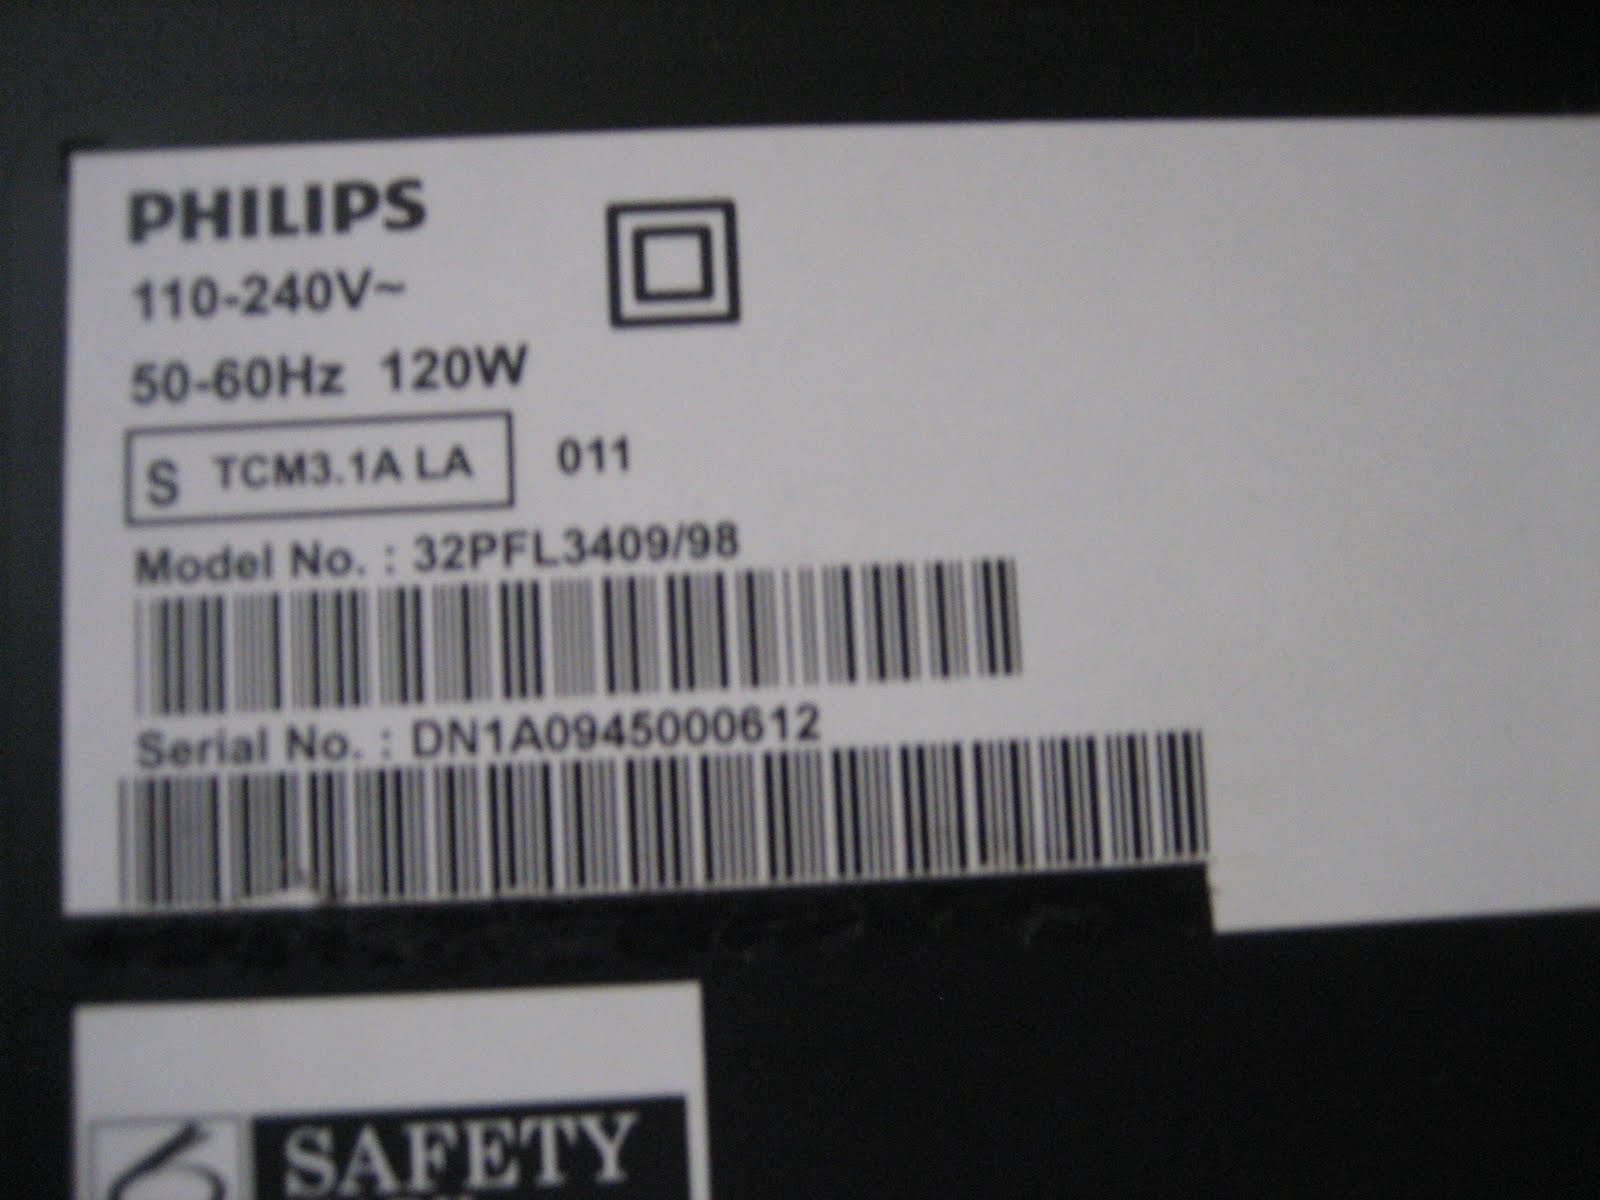 Electronics Etc                        : Philips LCD TV